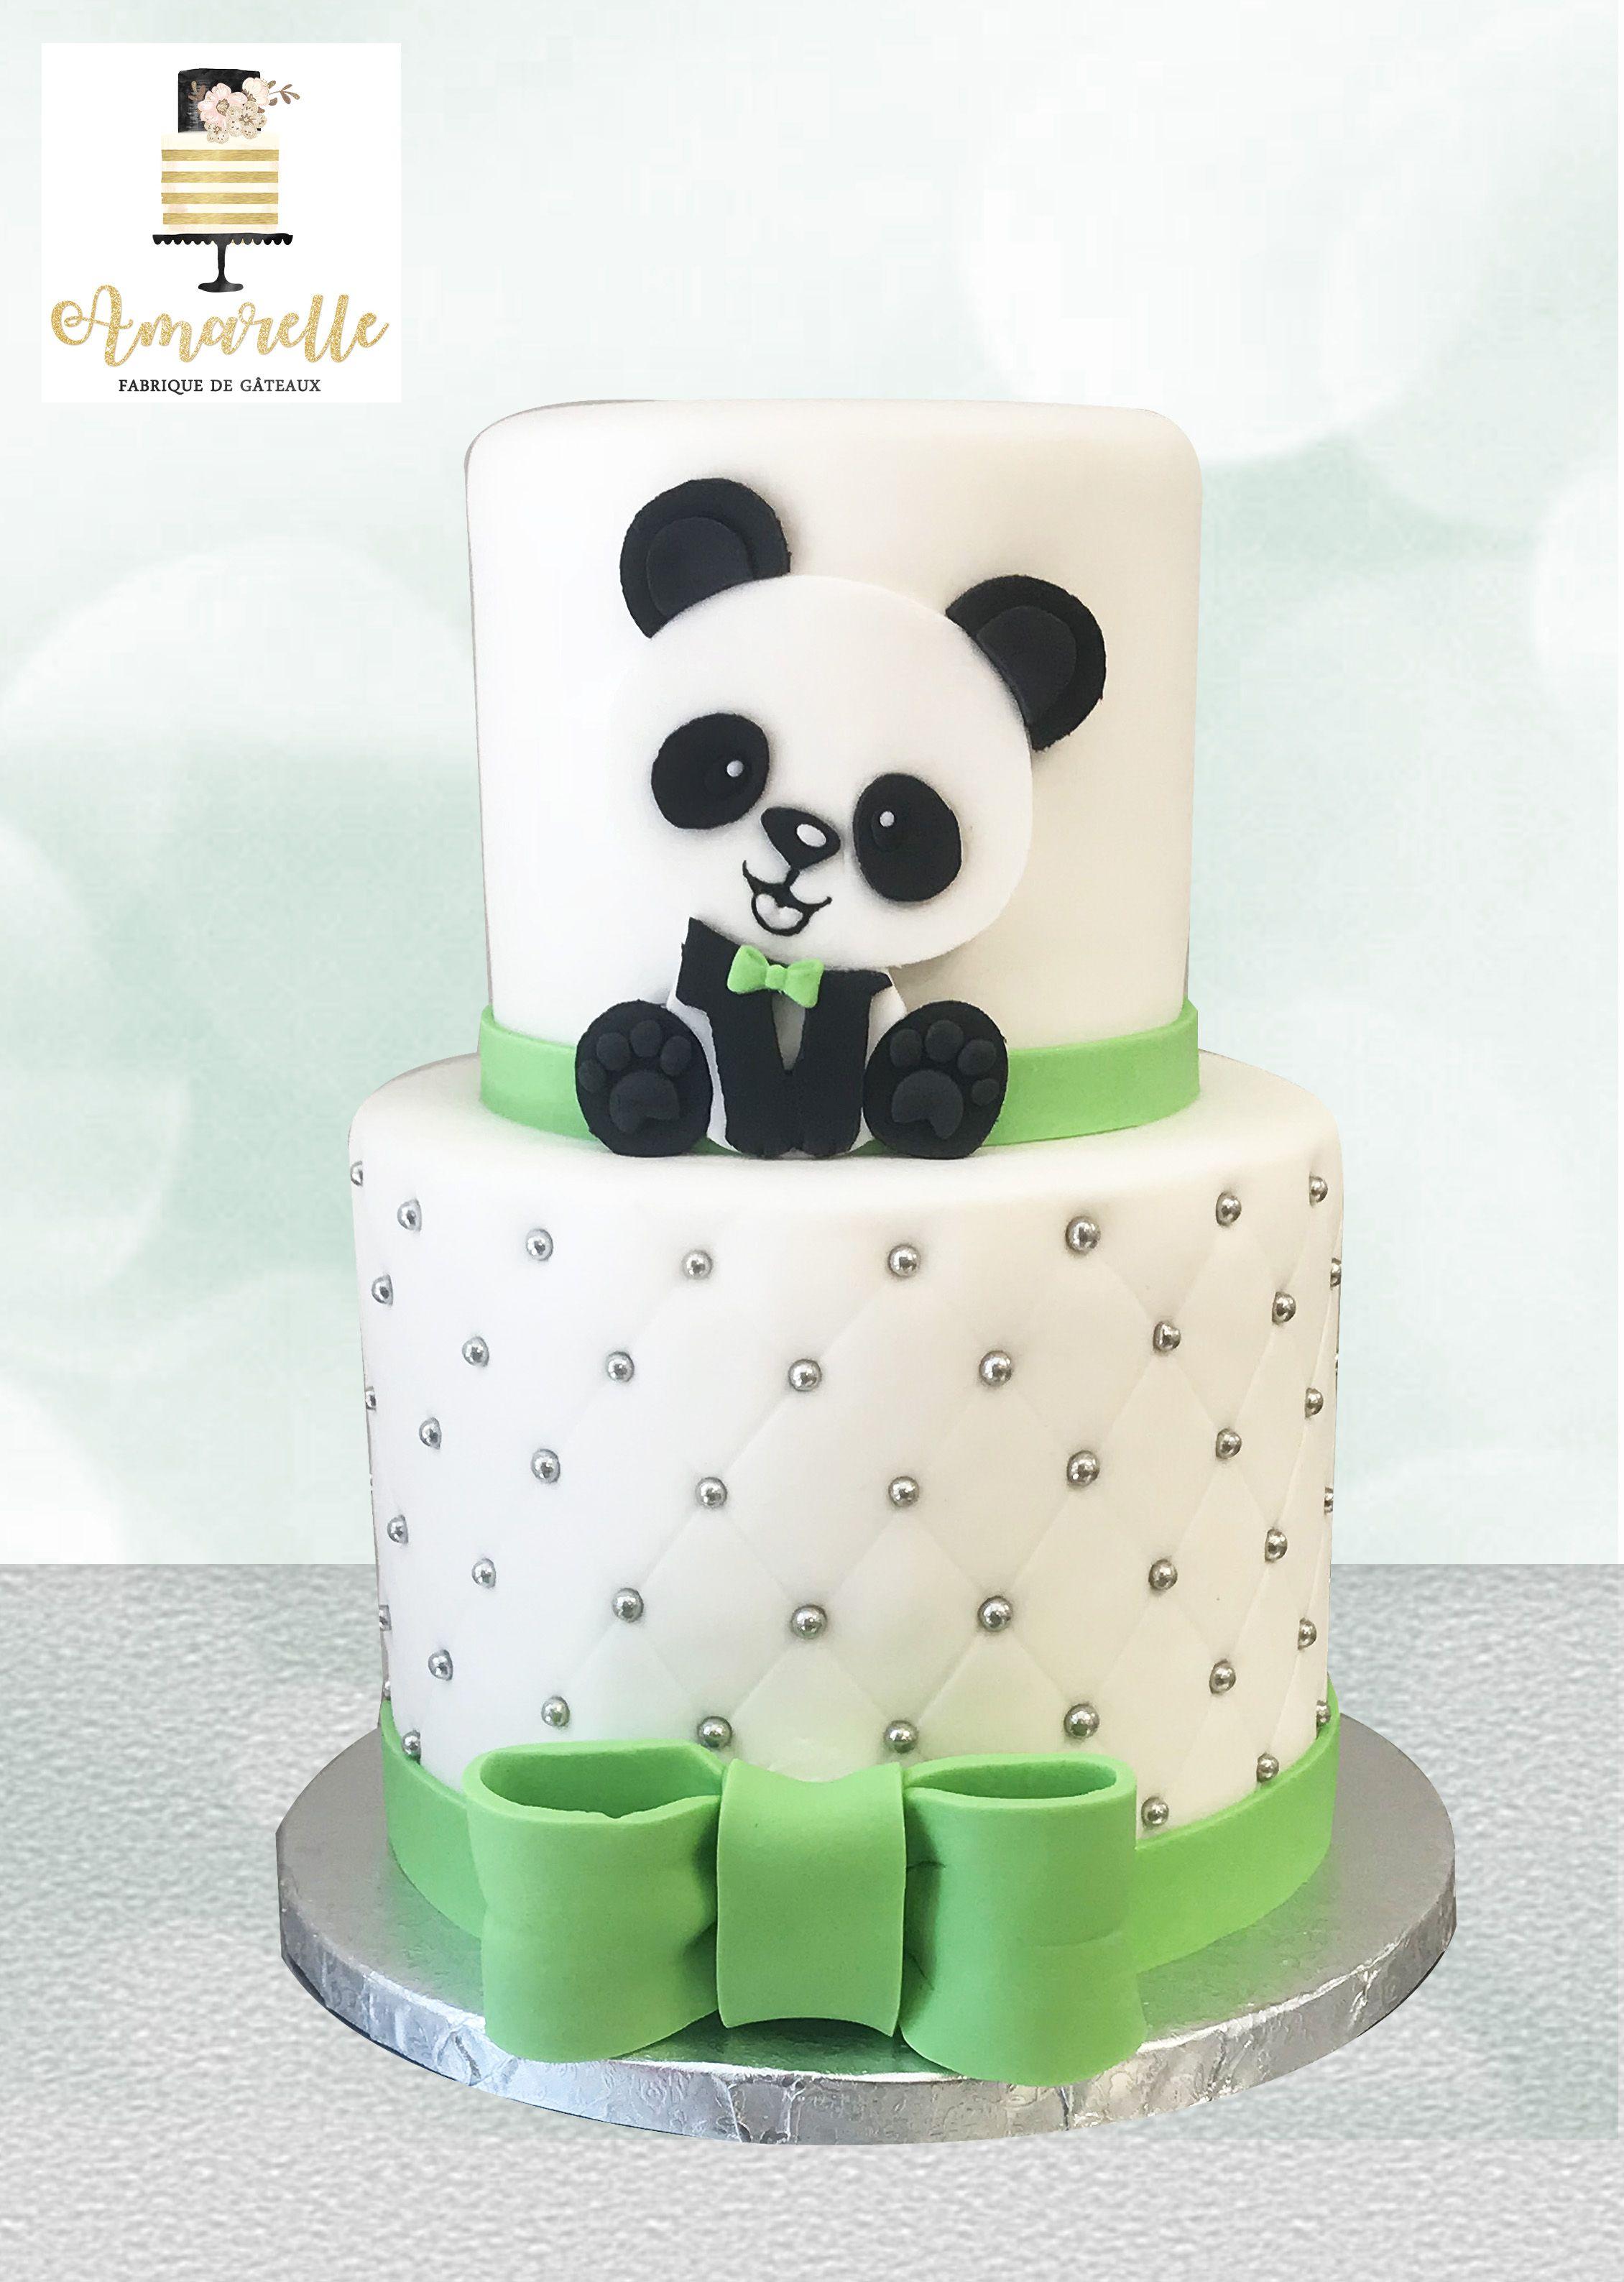 Épinglé sur Gâteau